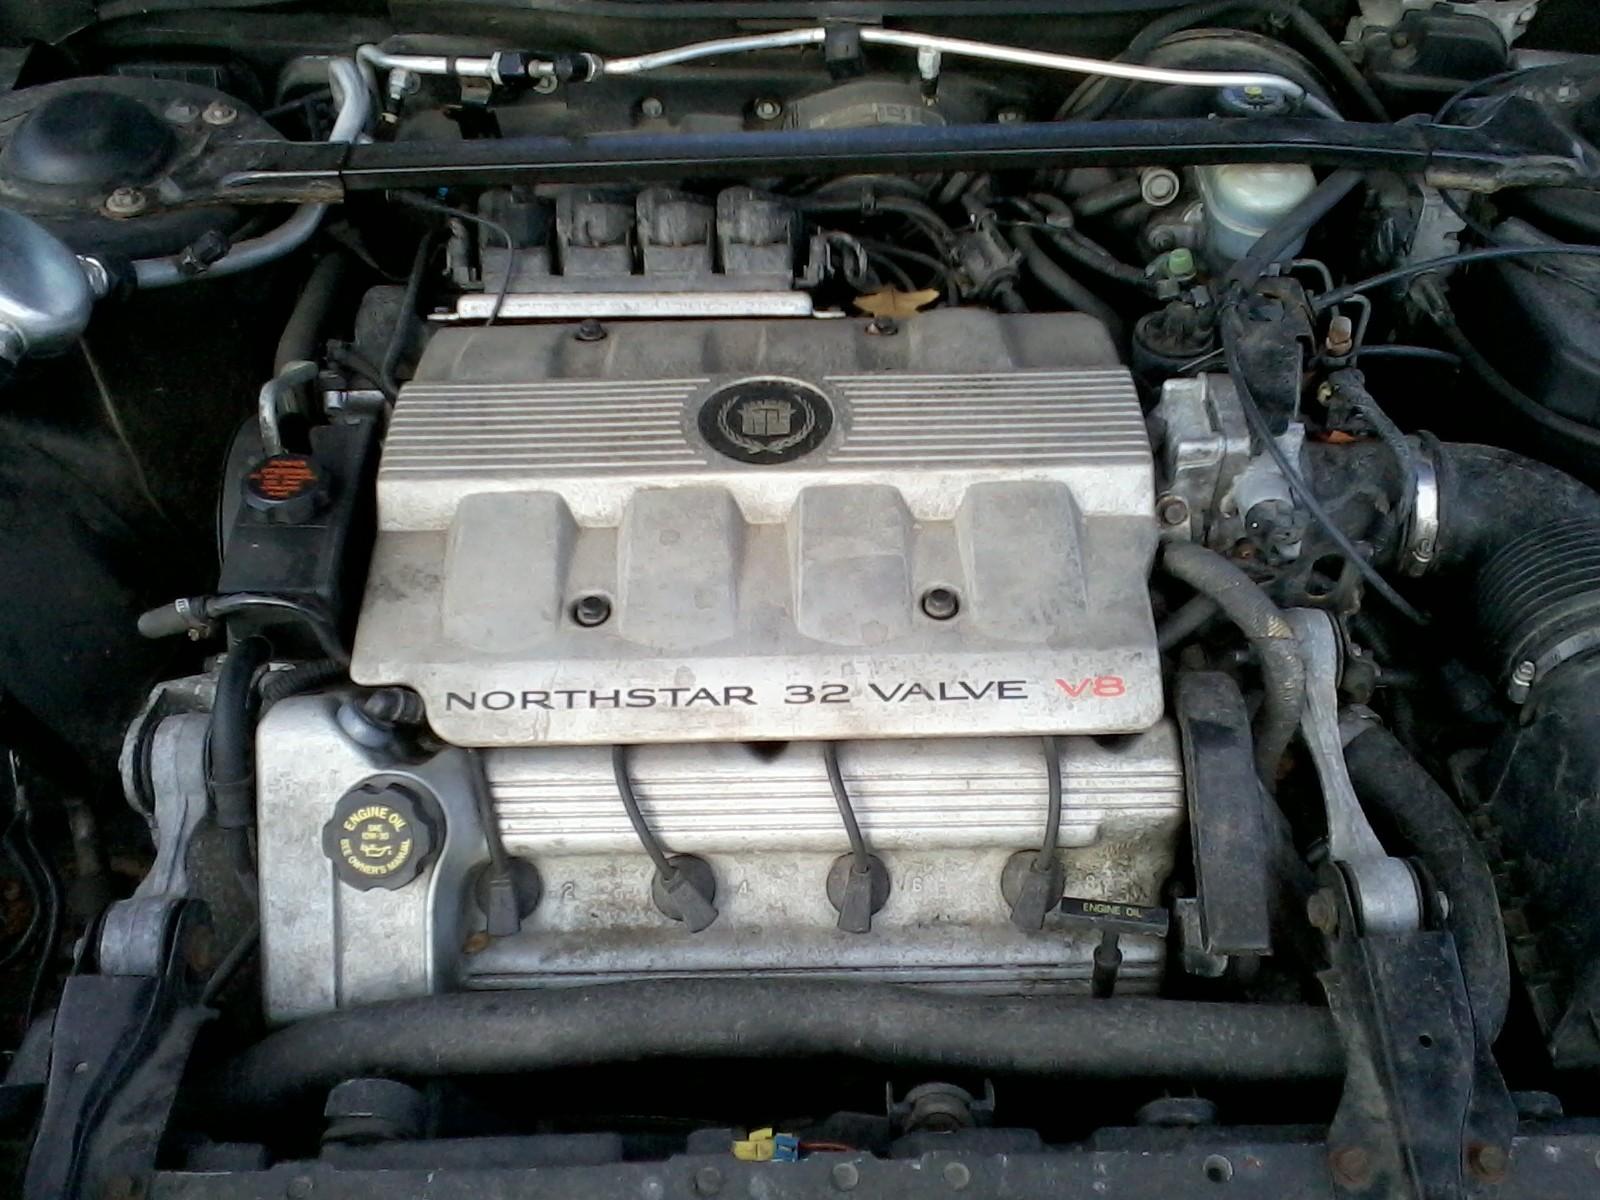 Northstar Engine Diagram northstar Engine Series Of Northstar Engine Diagram Cadillac V8 Engine